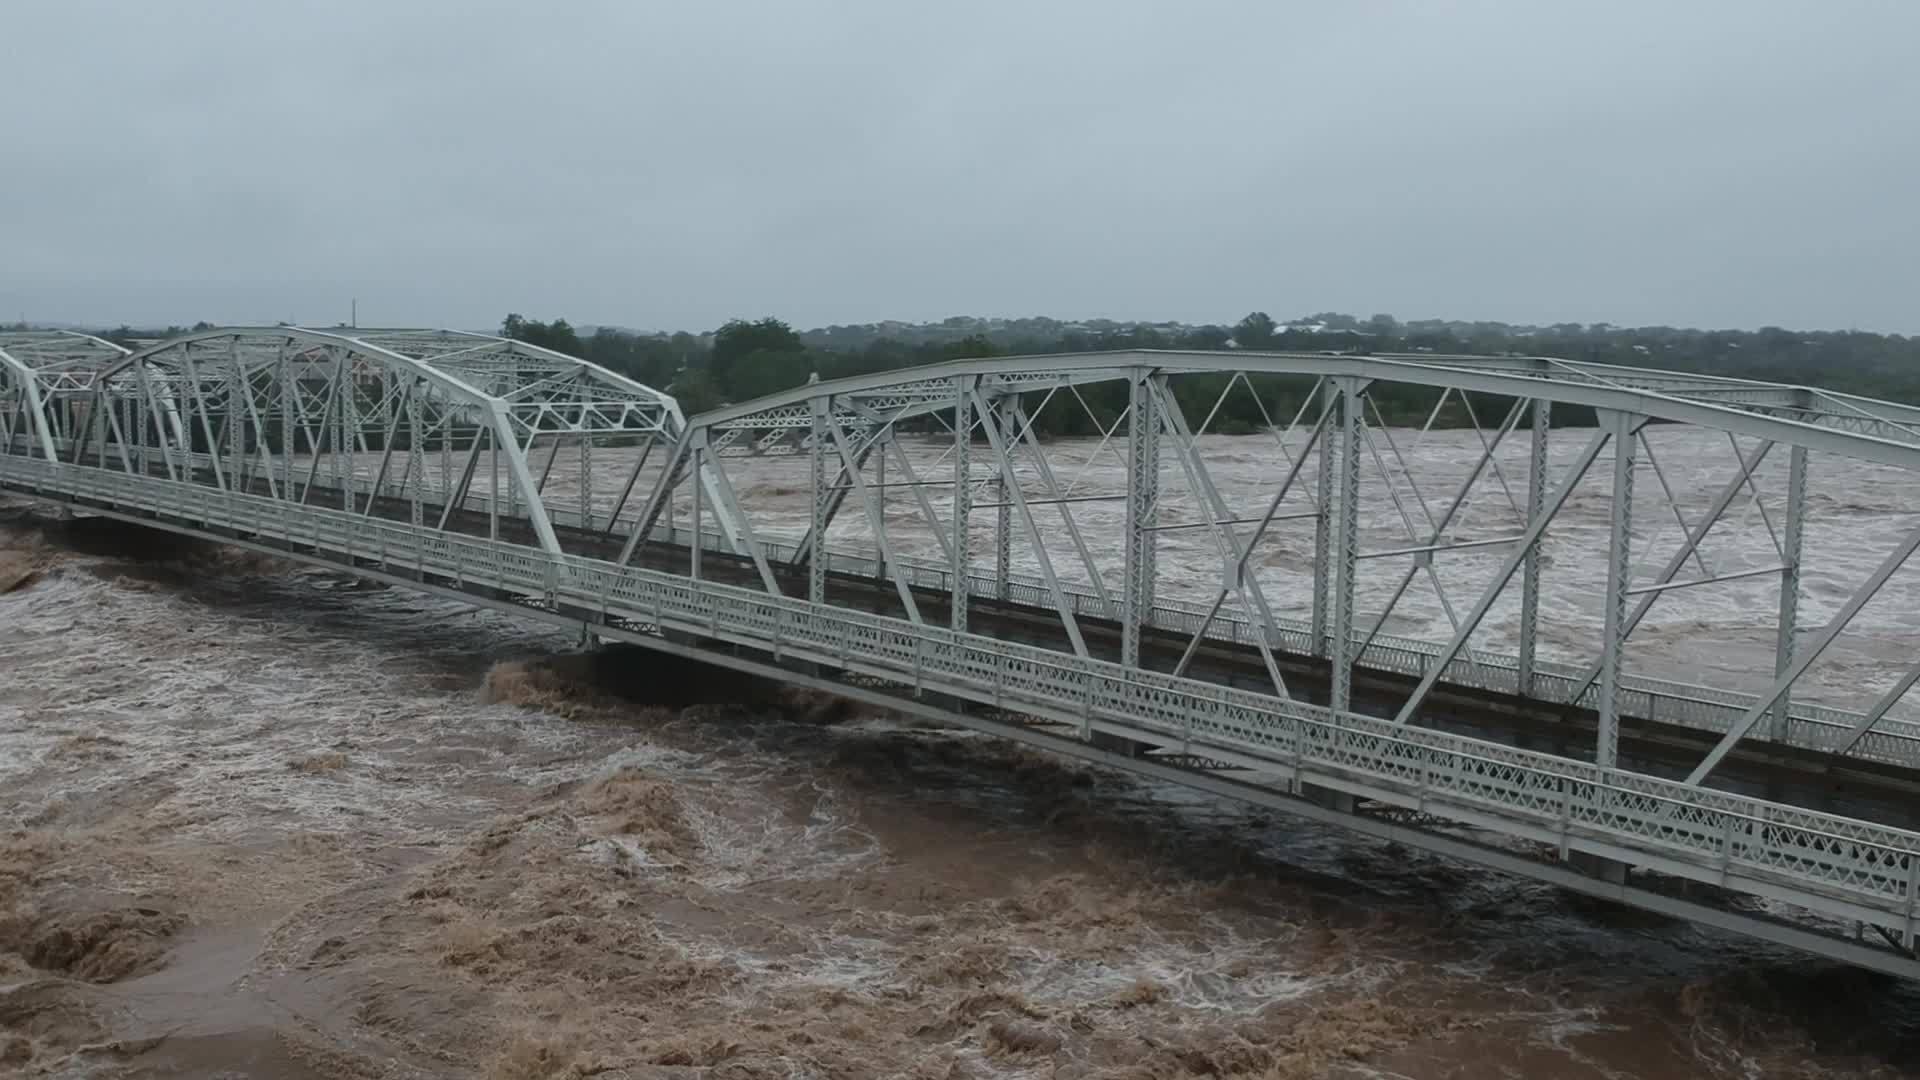 Floodwaters under Inks Bridge in Llano on Oct. 16, 2018